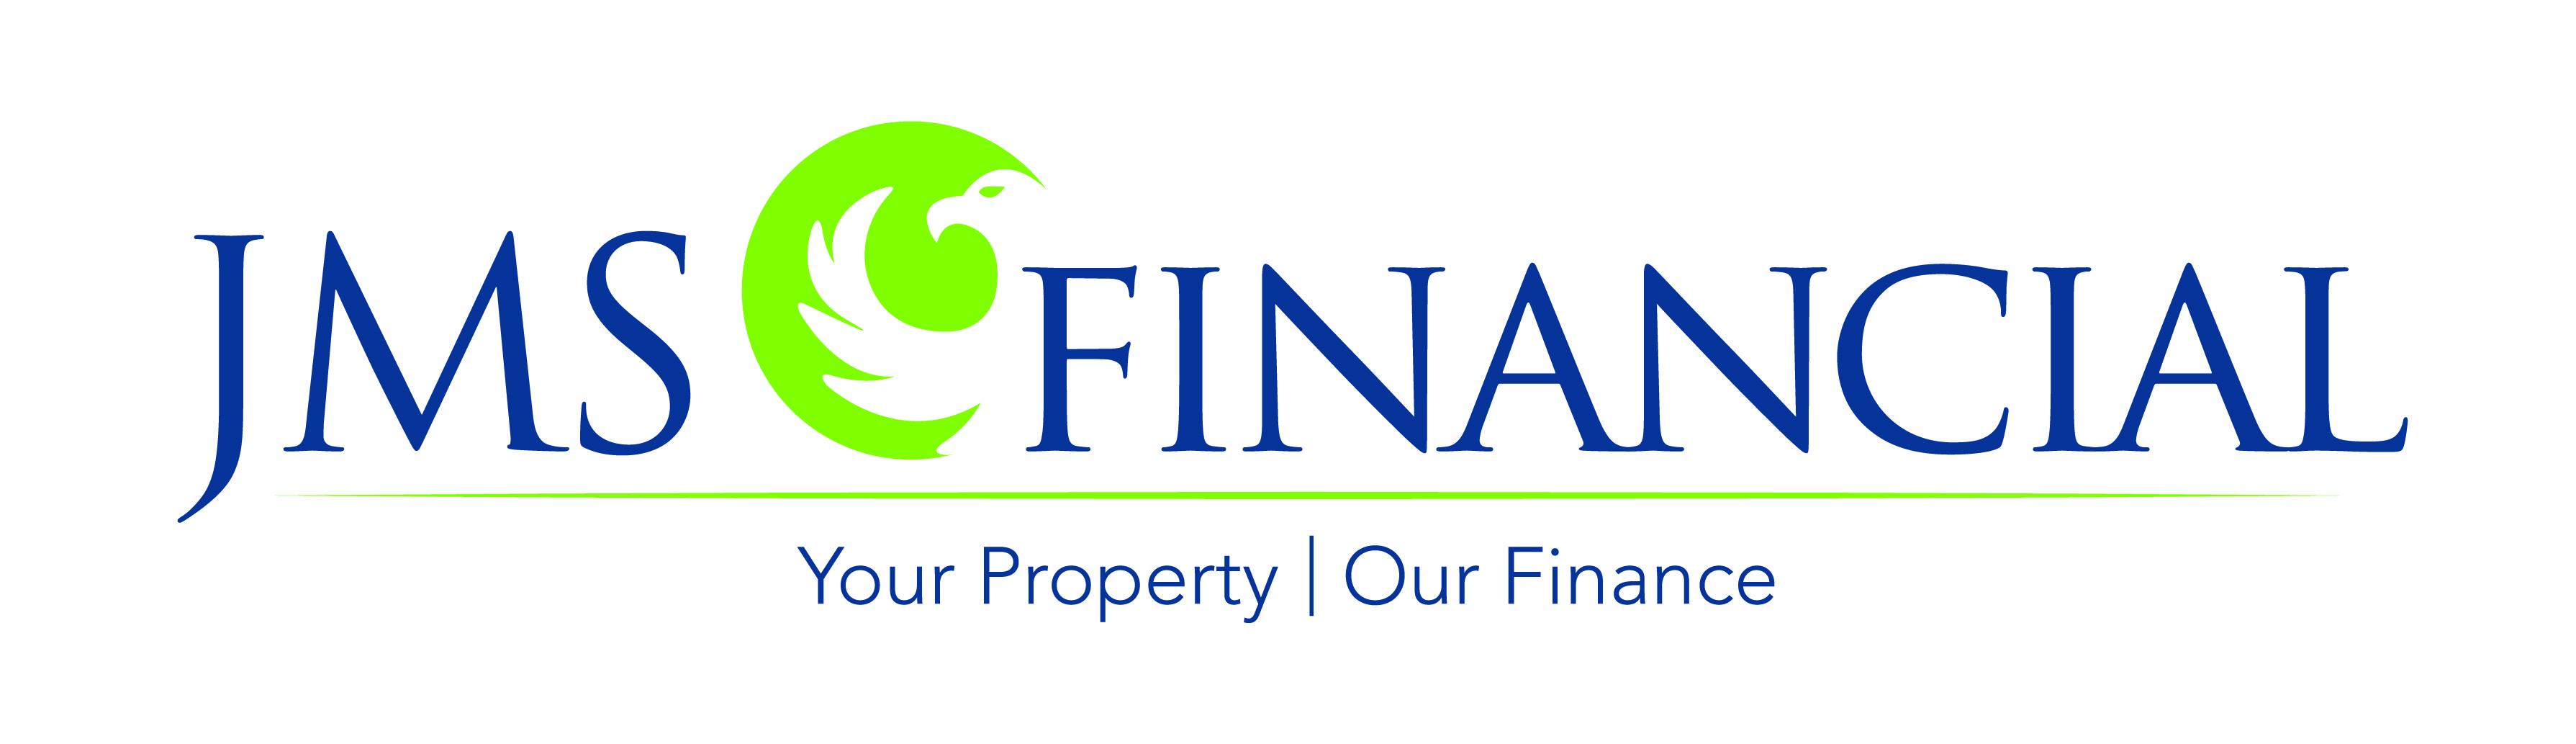 93217656 JMS Financial logo